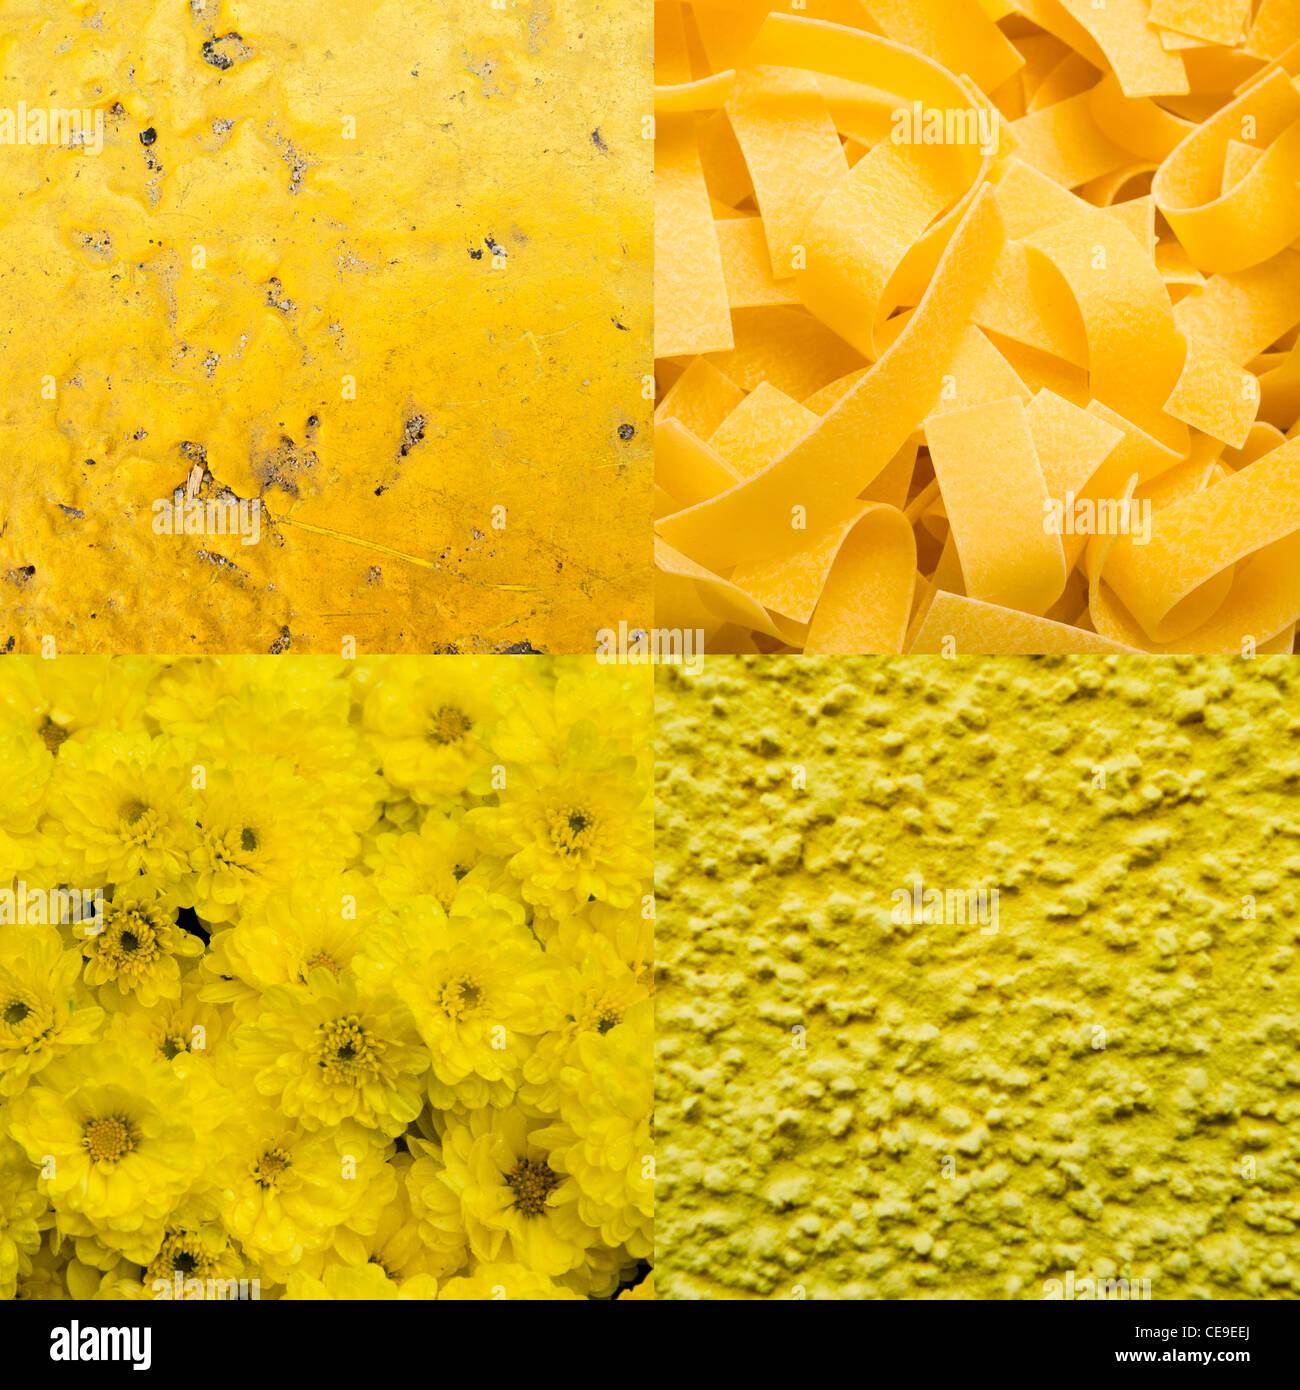 Collage de amarillo fondos de textura abstracta Foto de stock